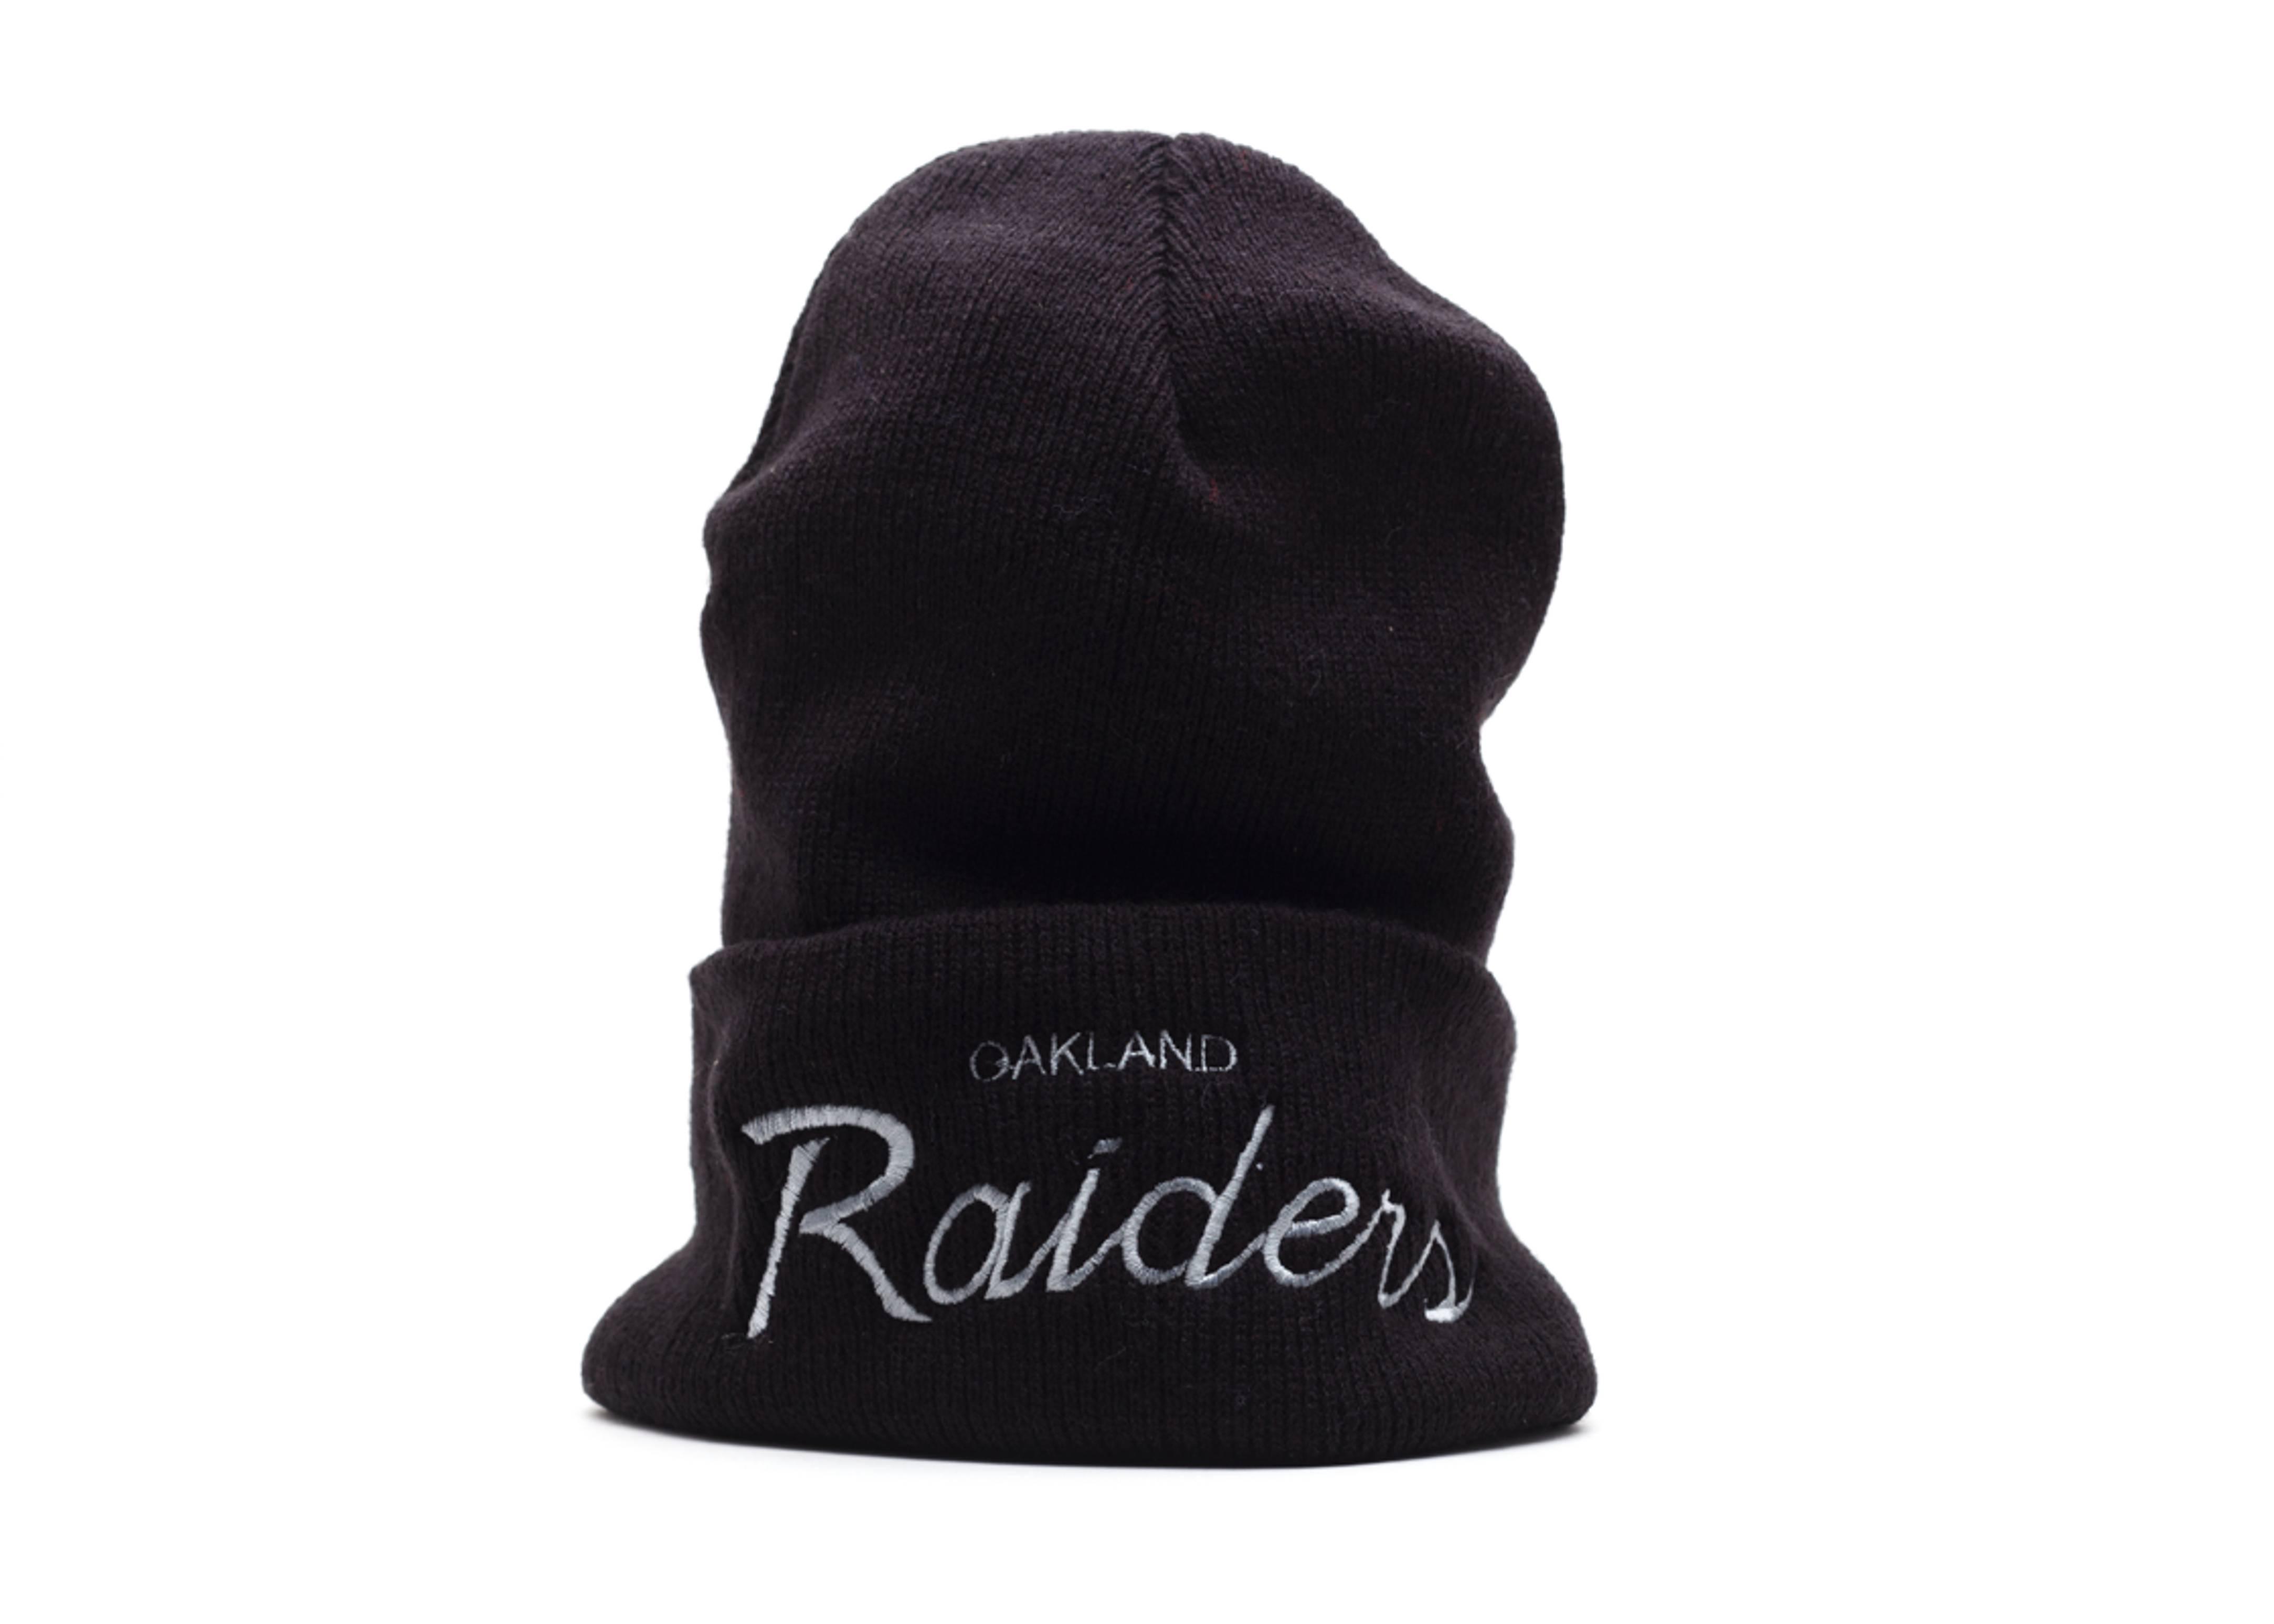 oakland raiders cuffed knit beanie